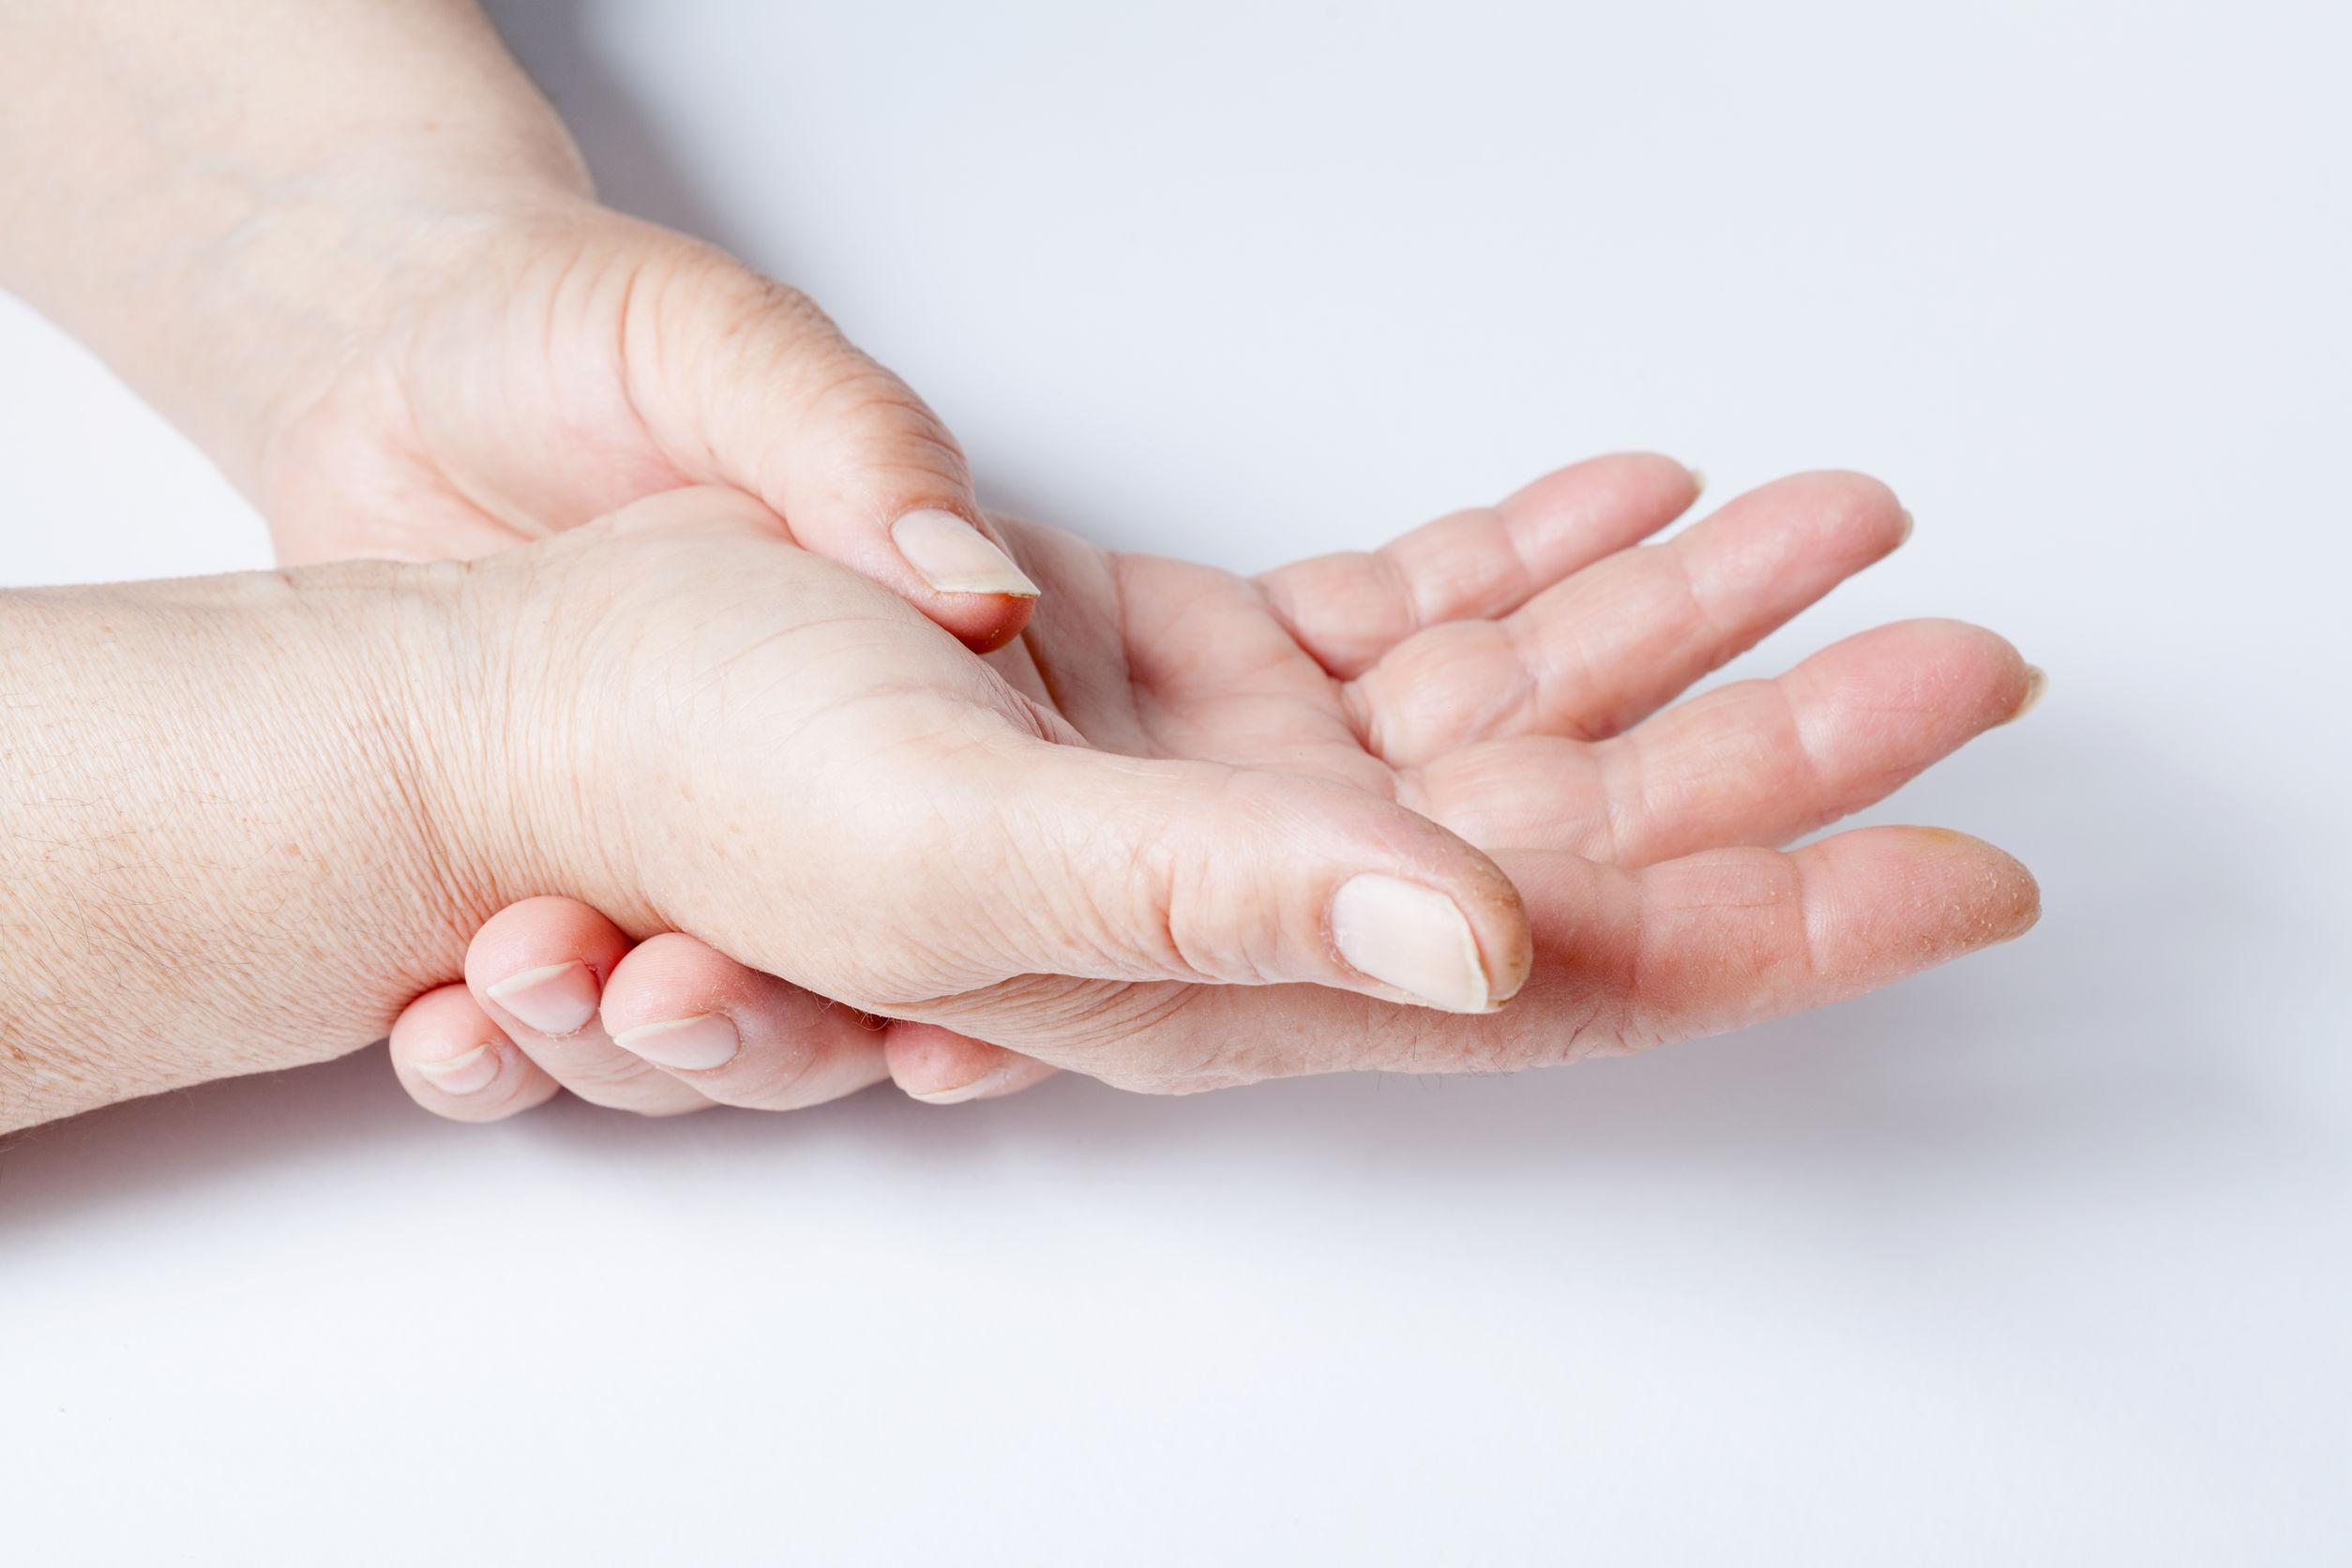 fibromialgia, causas, diagnóstico y síntomas